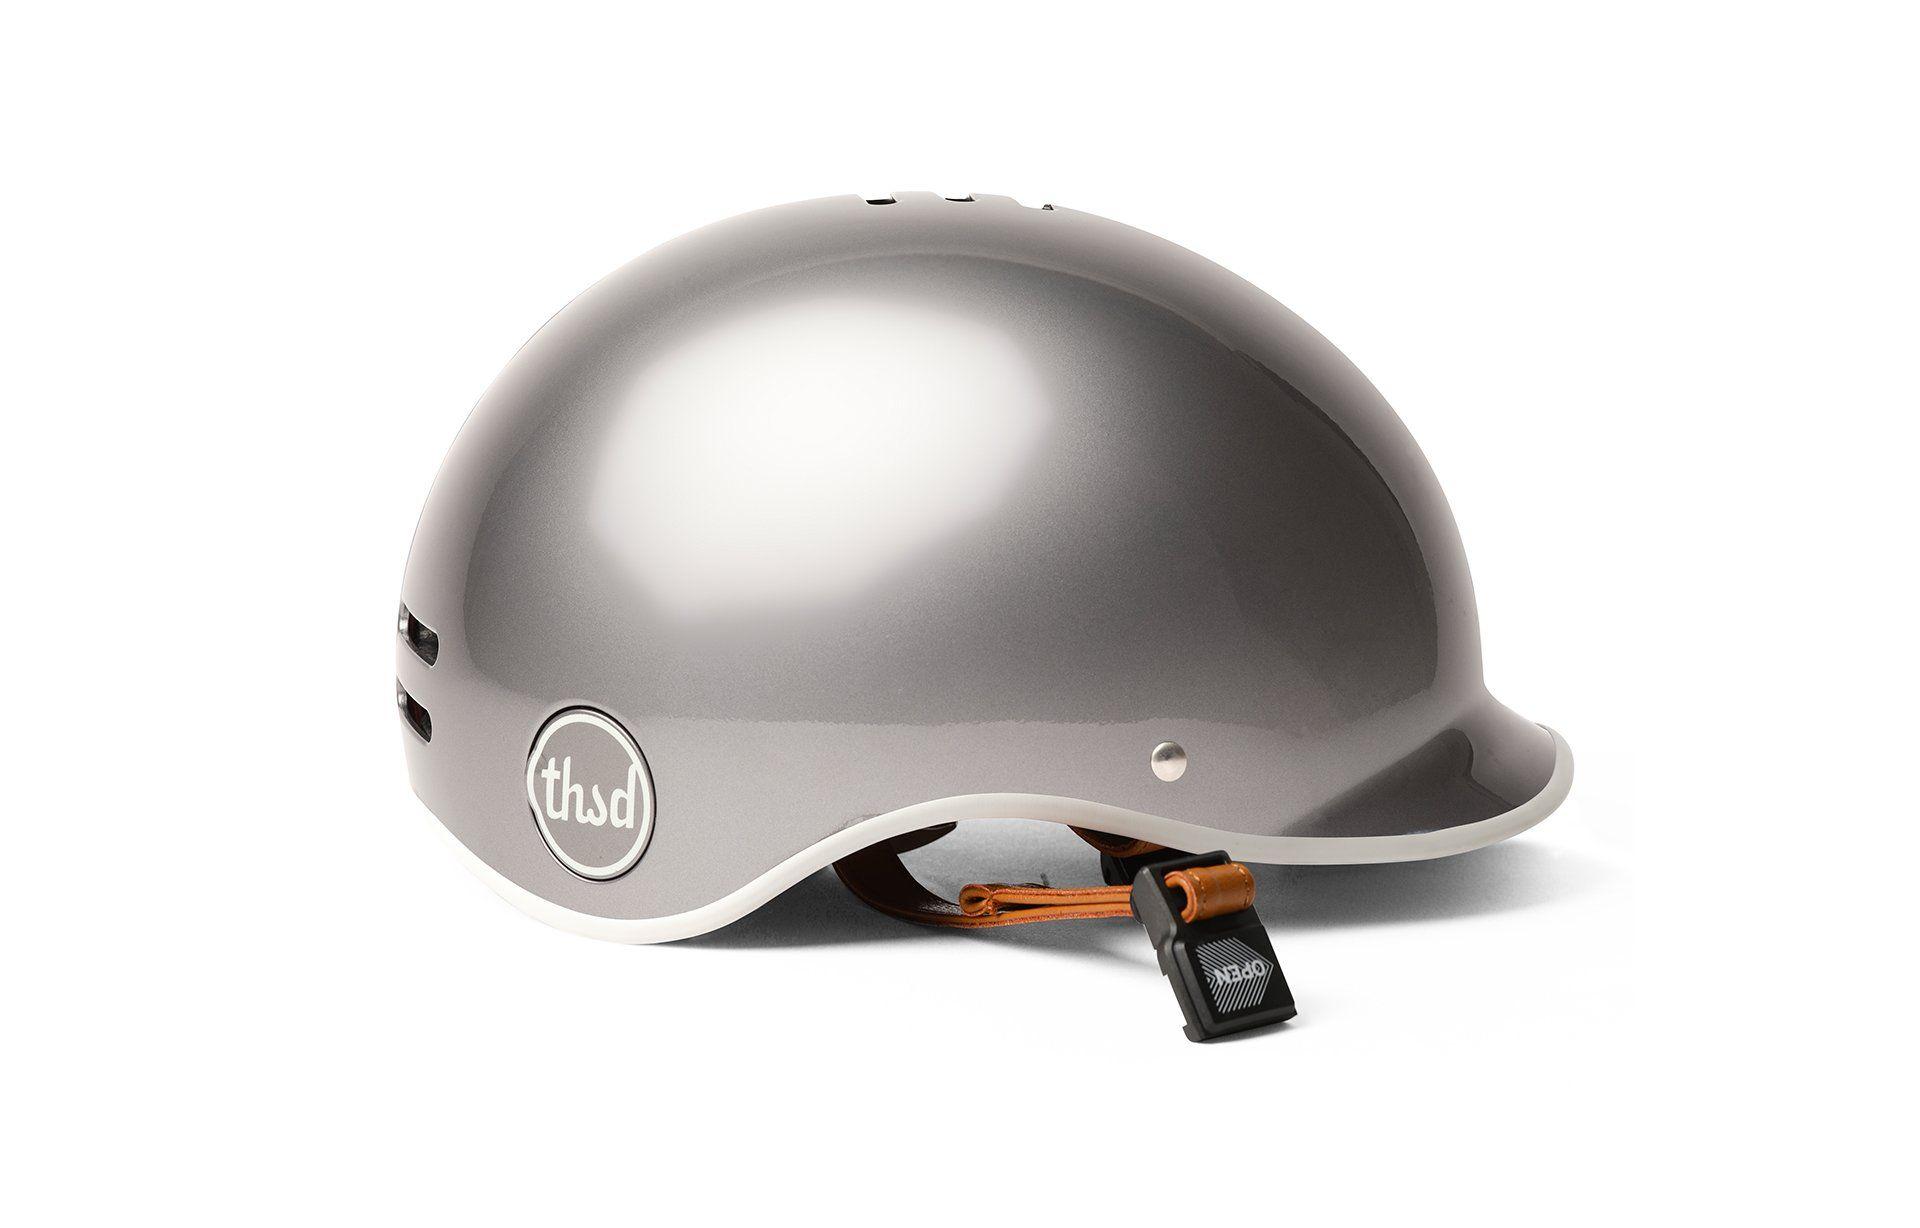 Thousand Heritage Helmet By Thousand In 2021 Bike Helmet Helmet Retro Helmet